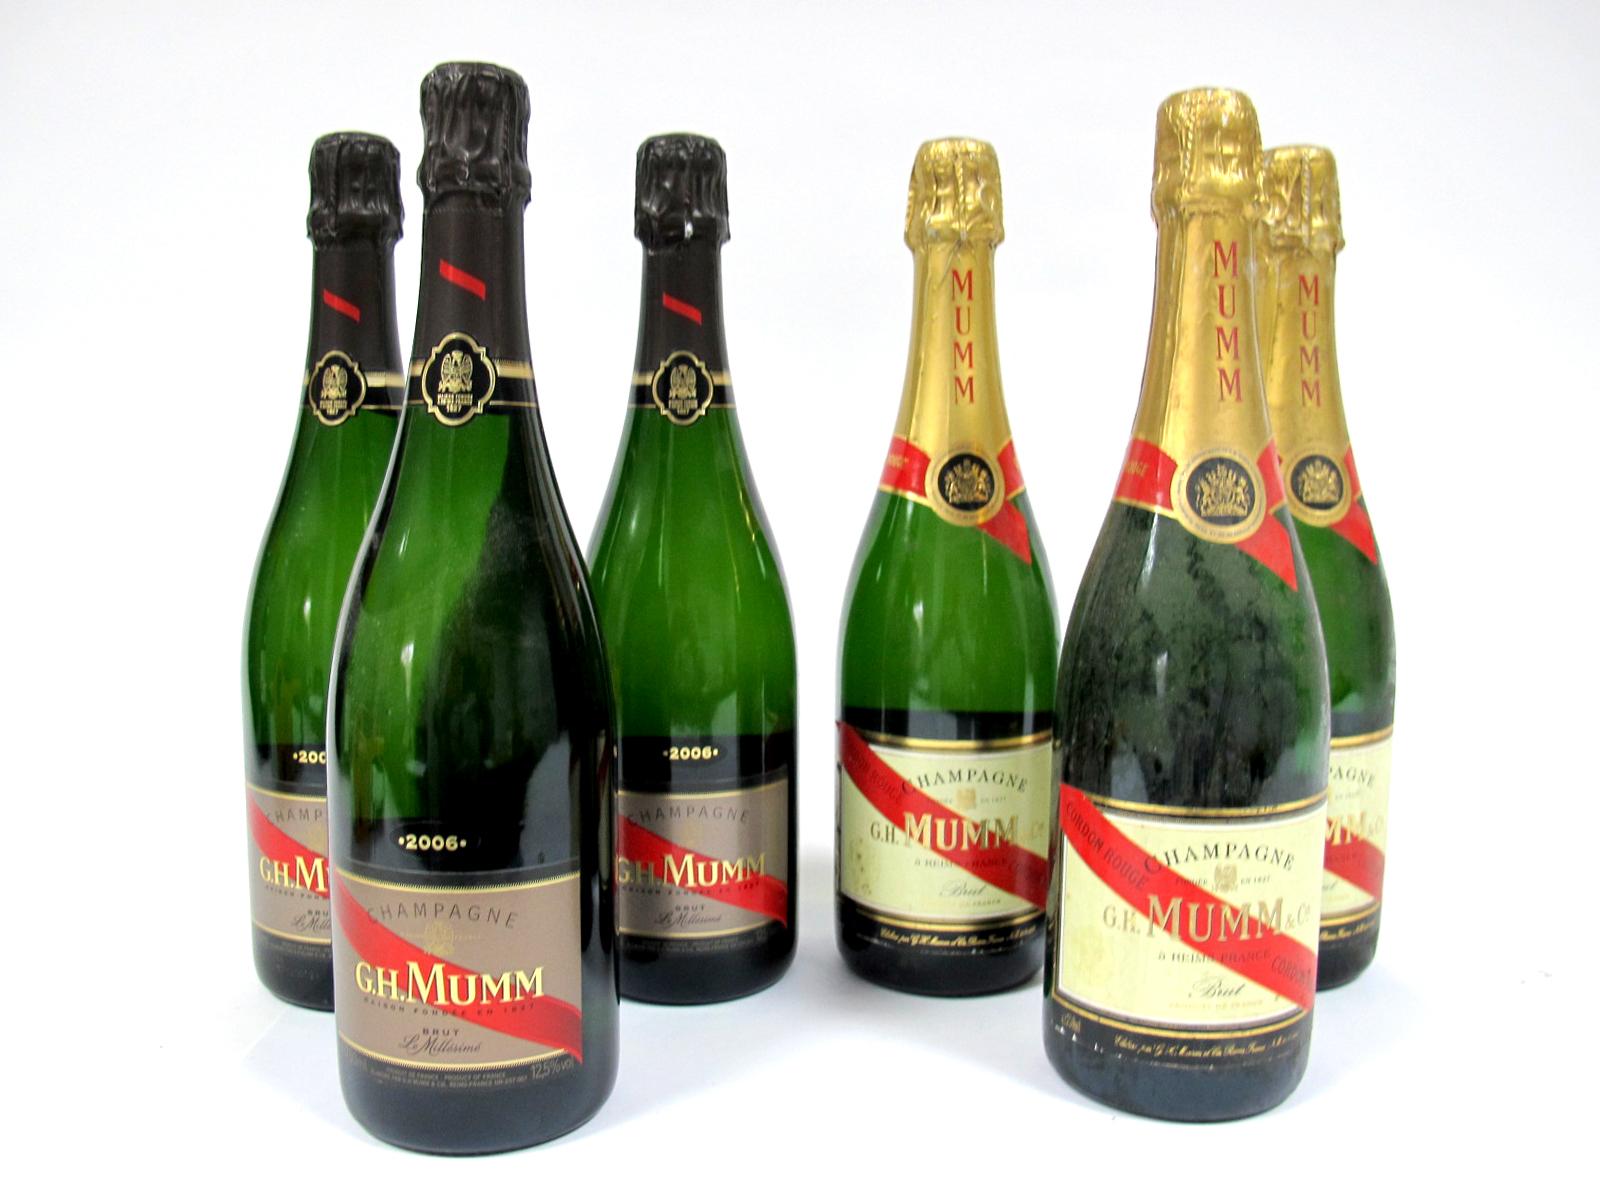 Lot 39 - Champagne - G.H. Mumm & Co. Brut Champagne 2006, 750ml, 12.5% Vol., three bottles; G.H. Mumm & Co.